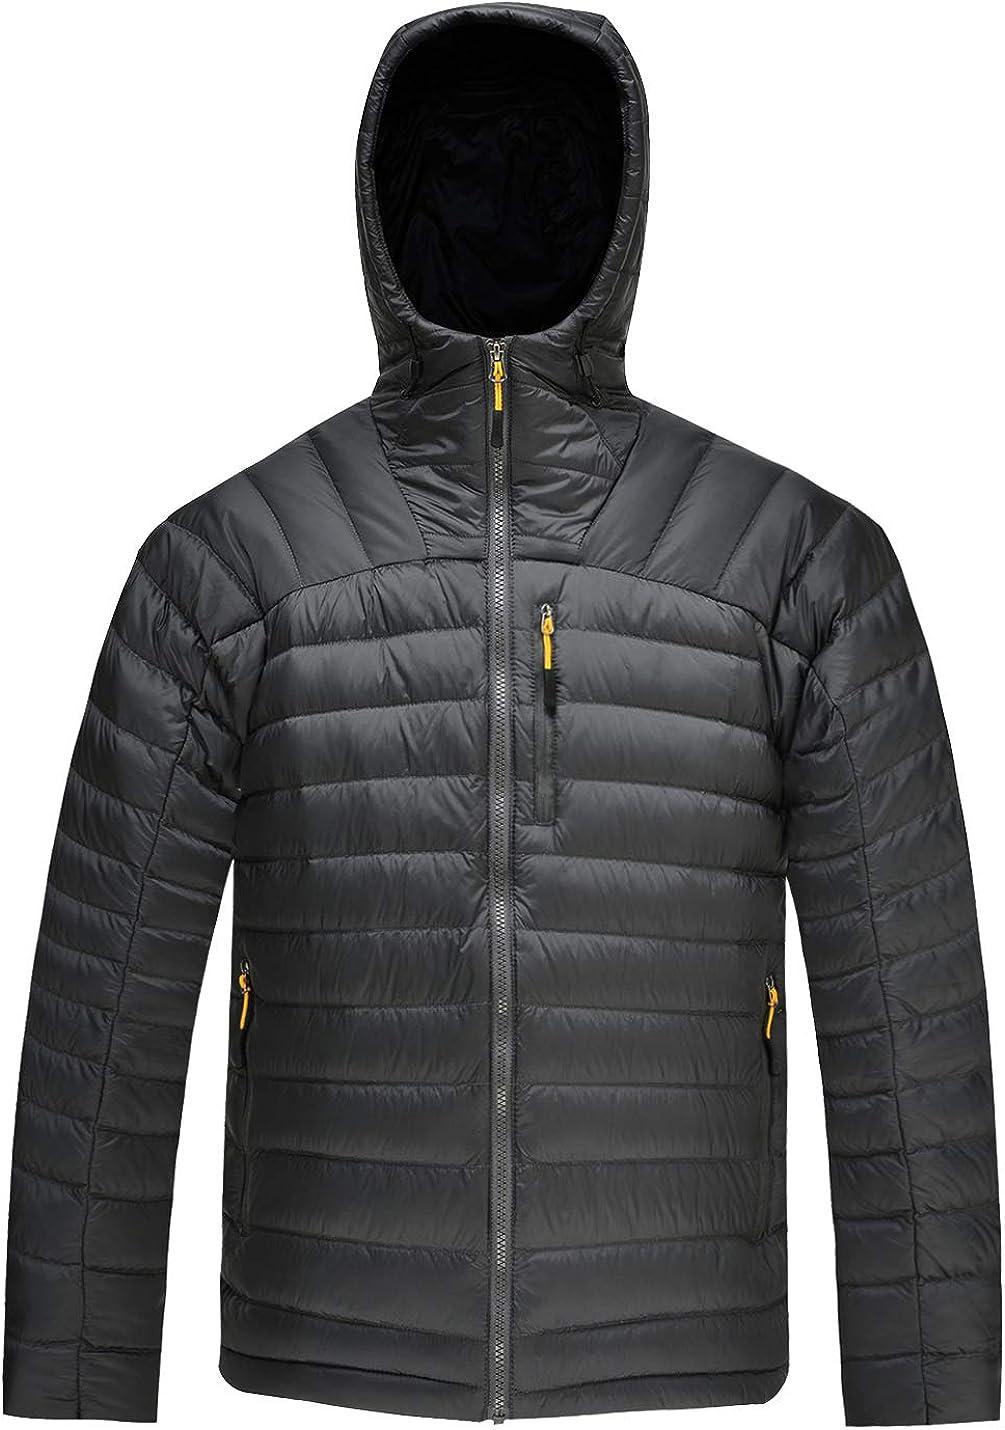 HARD LAND Men's Down Jacket Packable,Water Resistant 5 Pockets Hooded Puffer Jacket Lightweight